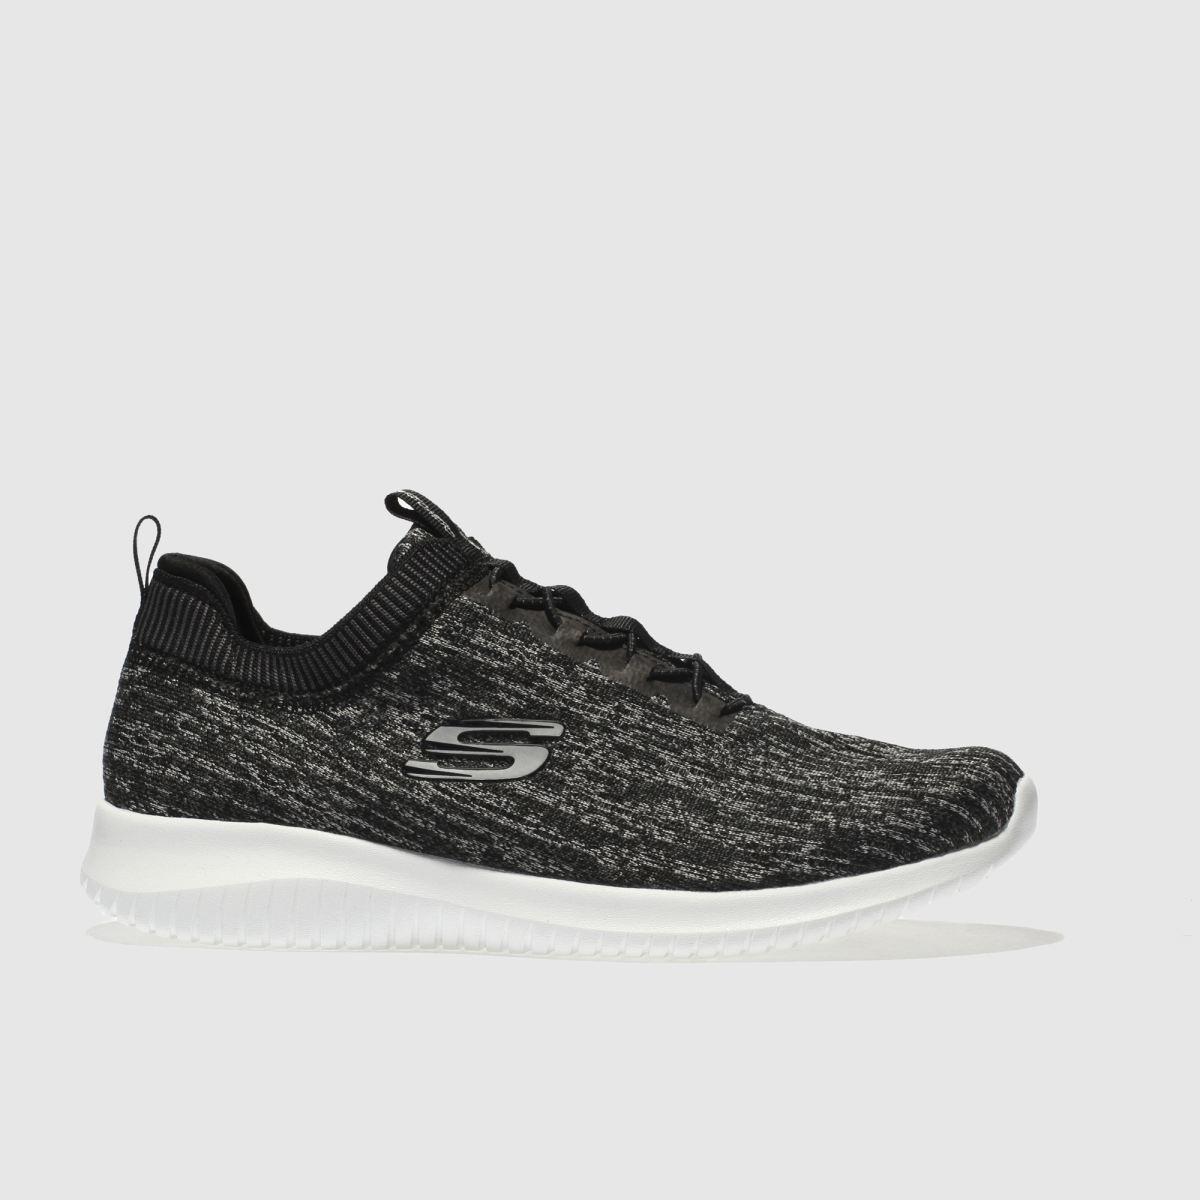 Skechers Black & Grey Ultra Flex Bright Trainers